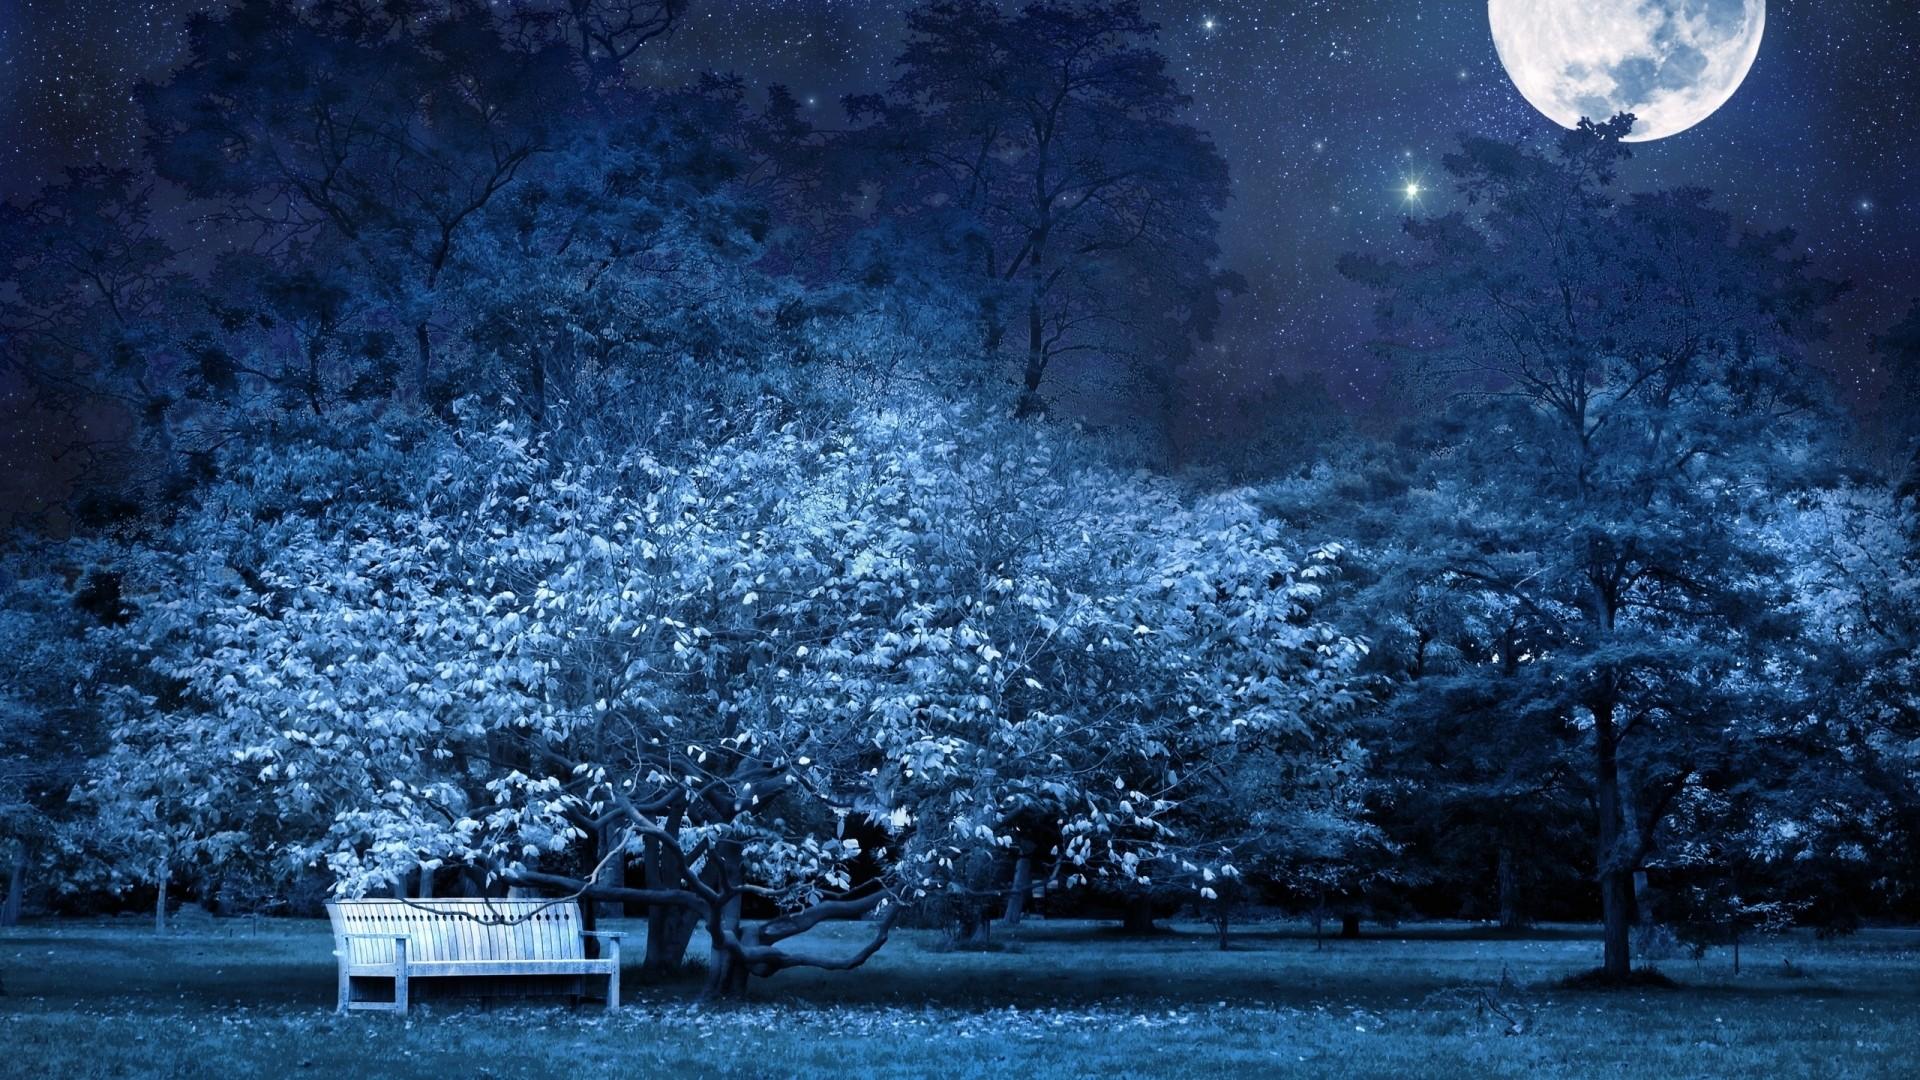 Preview wallpaper night, bench, park, trees, stars, full moon, sky